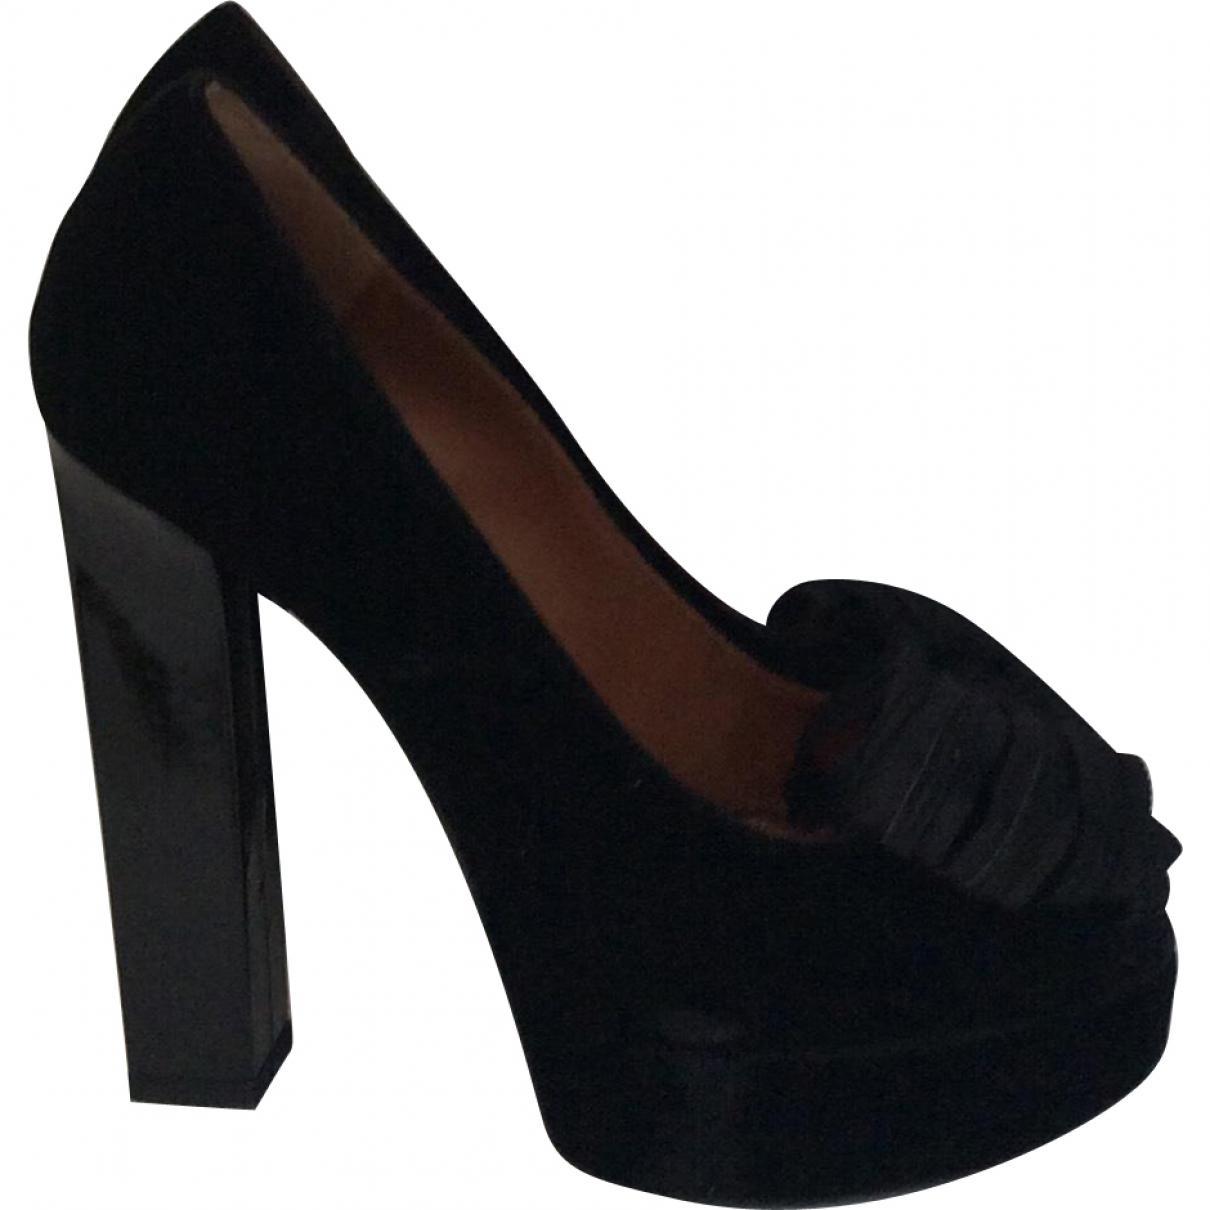 Pre-owned - Velvet heels Lanvin ARKqFW0ND1